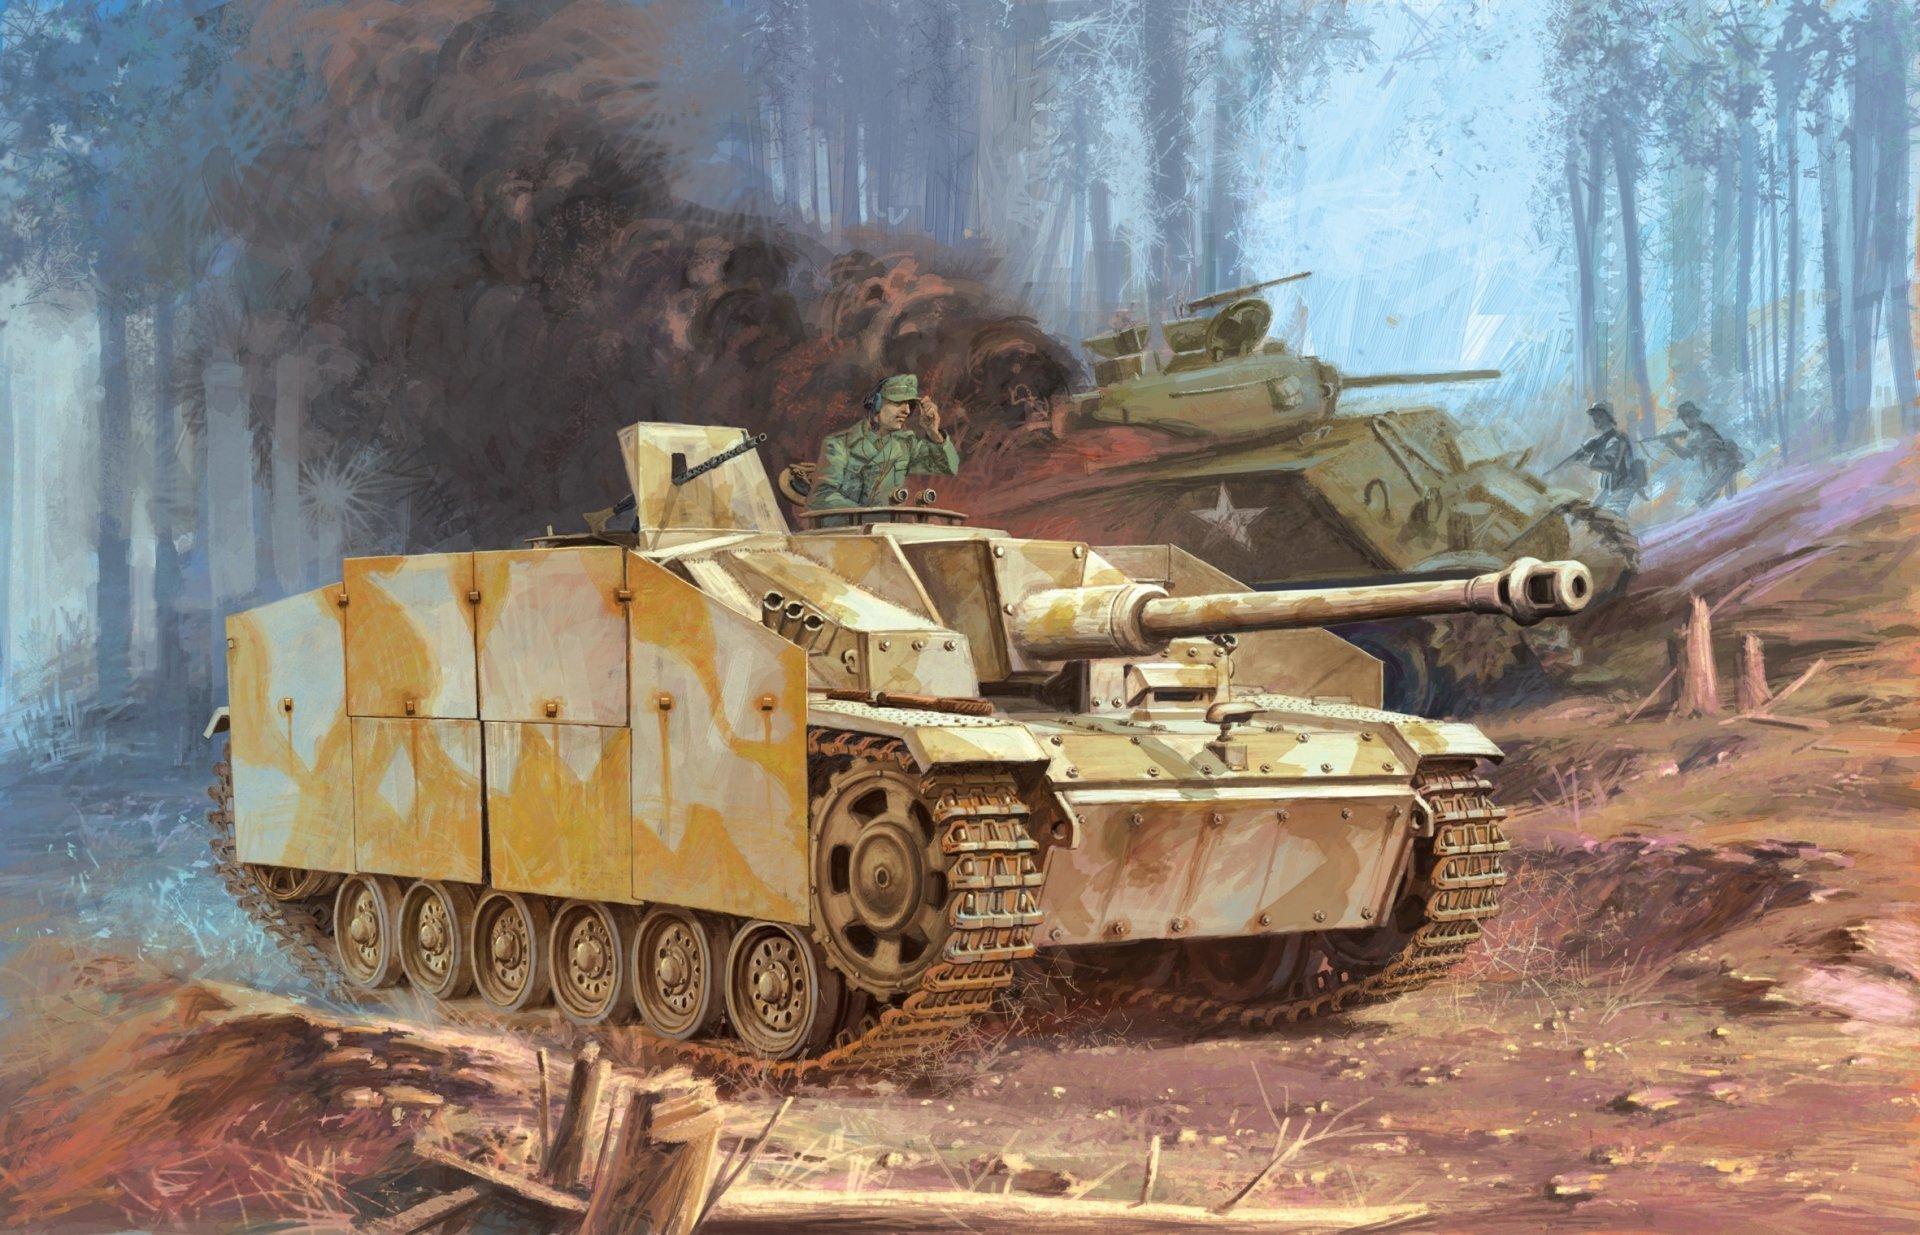 sturmgeschütz 1943 1945 weapons and warfare